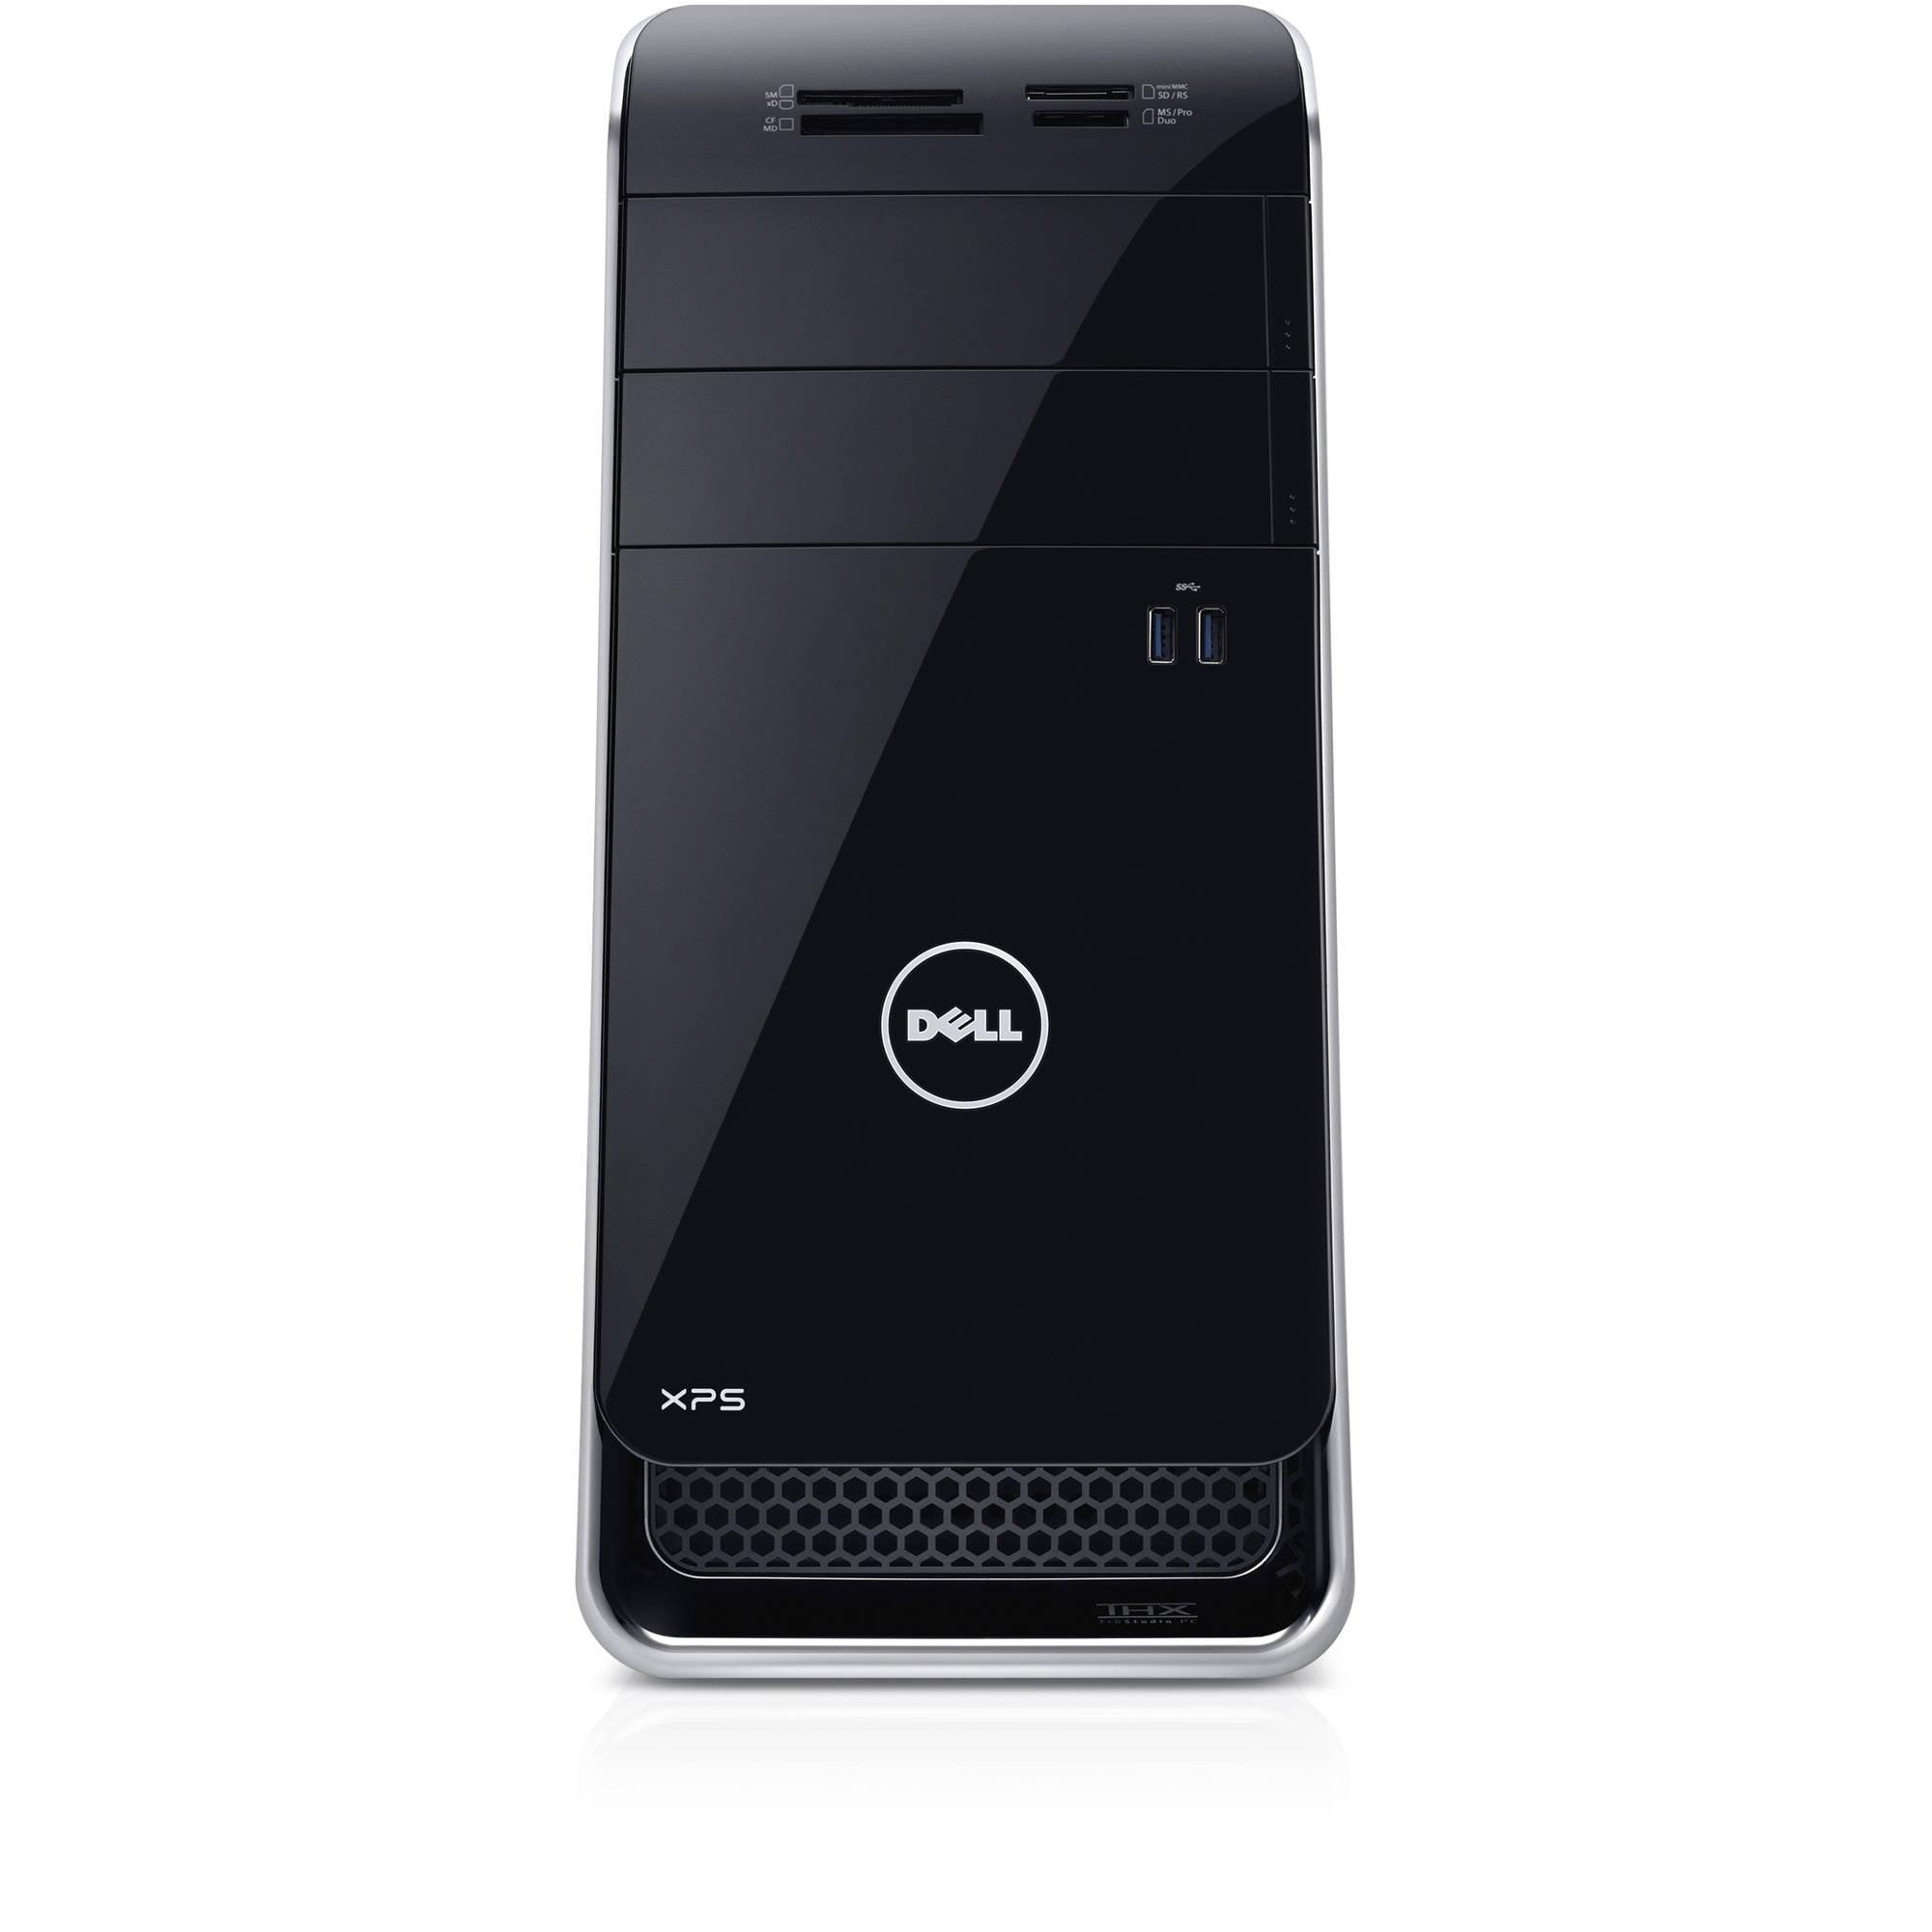 Dell XPS 8900 x8900-1444BLK Desktop PC with Intel Core i7-6700 Processor, 8GB Memory, 1TB Hard Drive and Windows 10 Home... by Dell